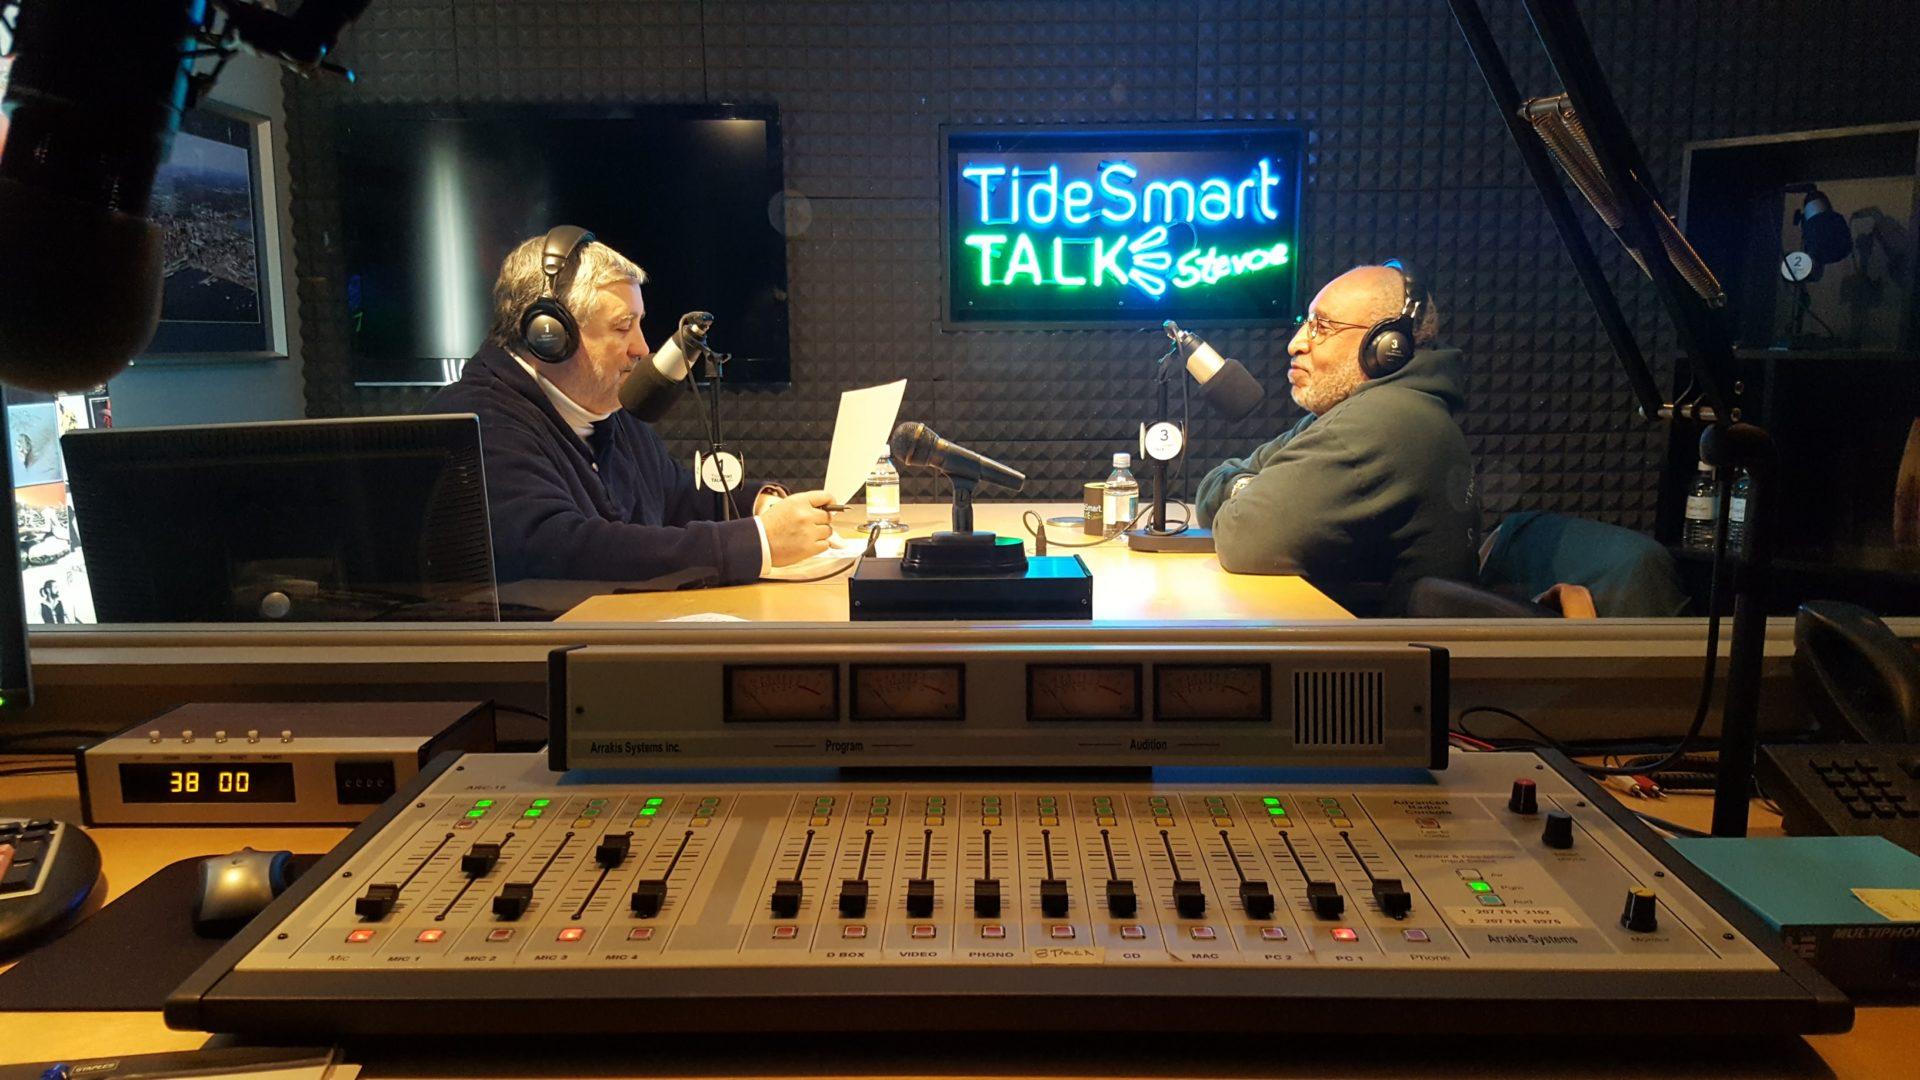 Host of TideSmart Talk with Stevoe, Steve Woods, welcomed Tim Wilson, Seeds of Peace Program Director (at right).